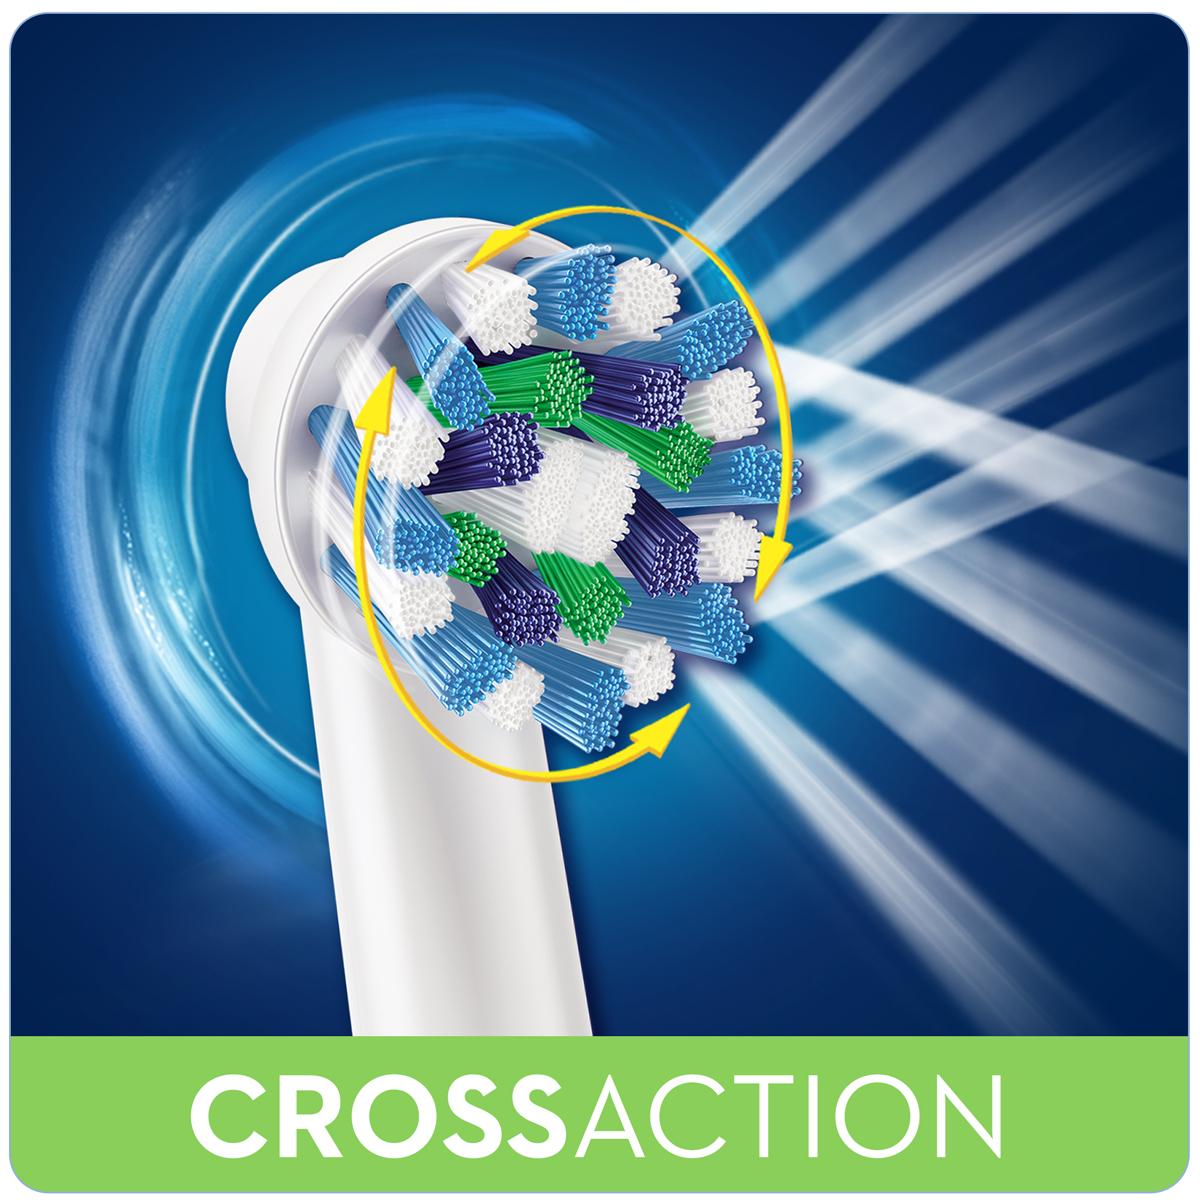 Электрическая зубная щетка Oral-B Vitality CrossAction (коробка) Oral-B